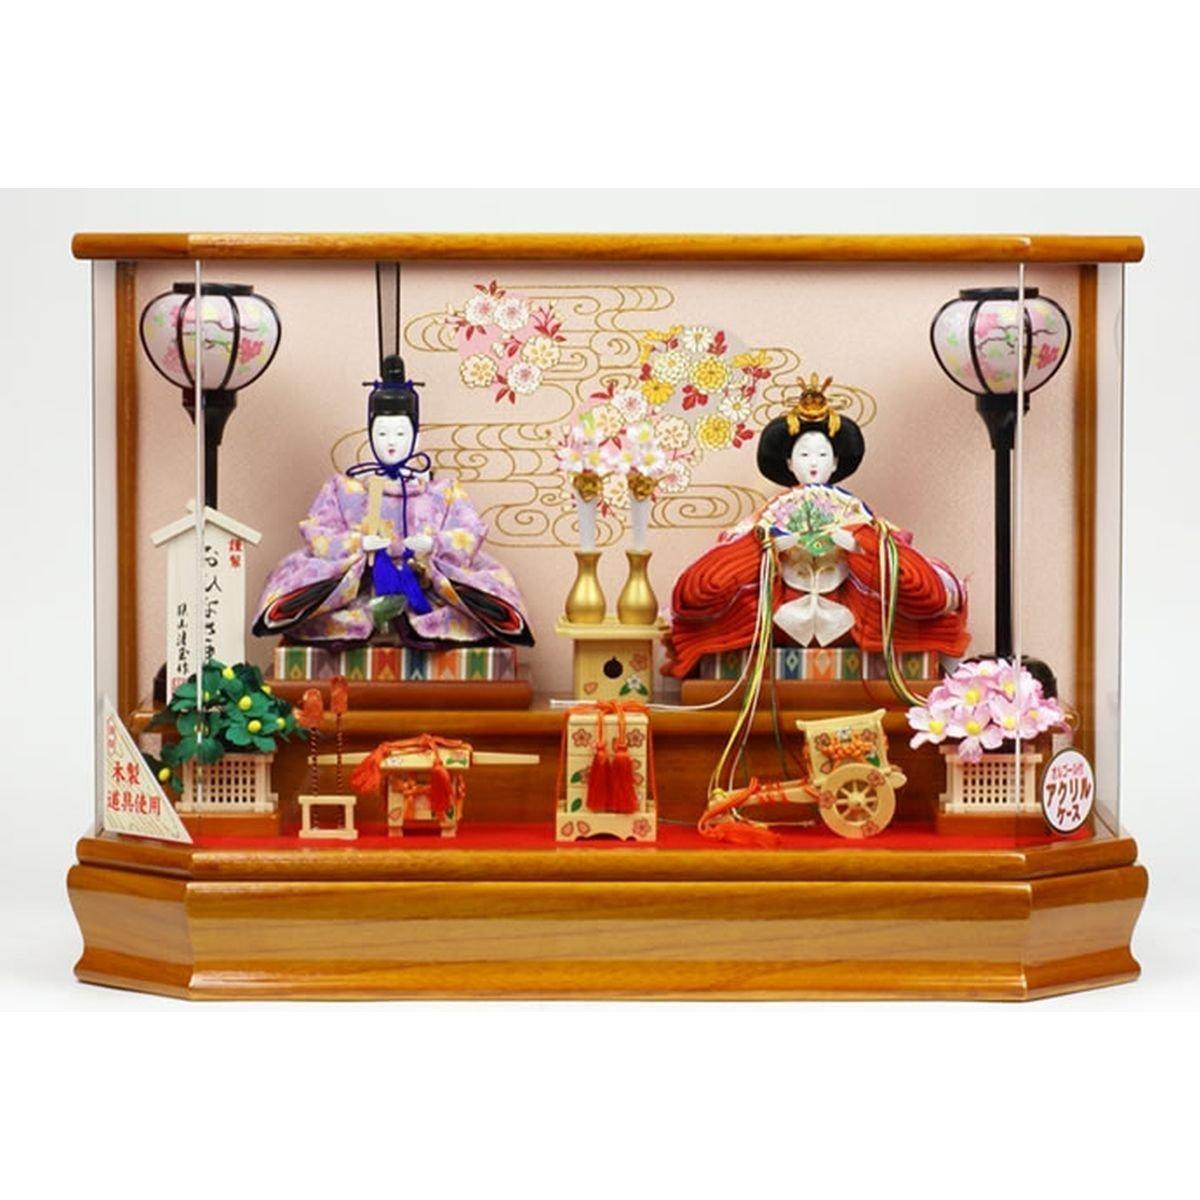 平安清玉 雛人形 親王飾り 間口56×奥行26×高さ39(cm) nas4-5-kk-1   B00ARBM05U